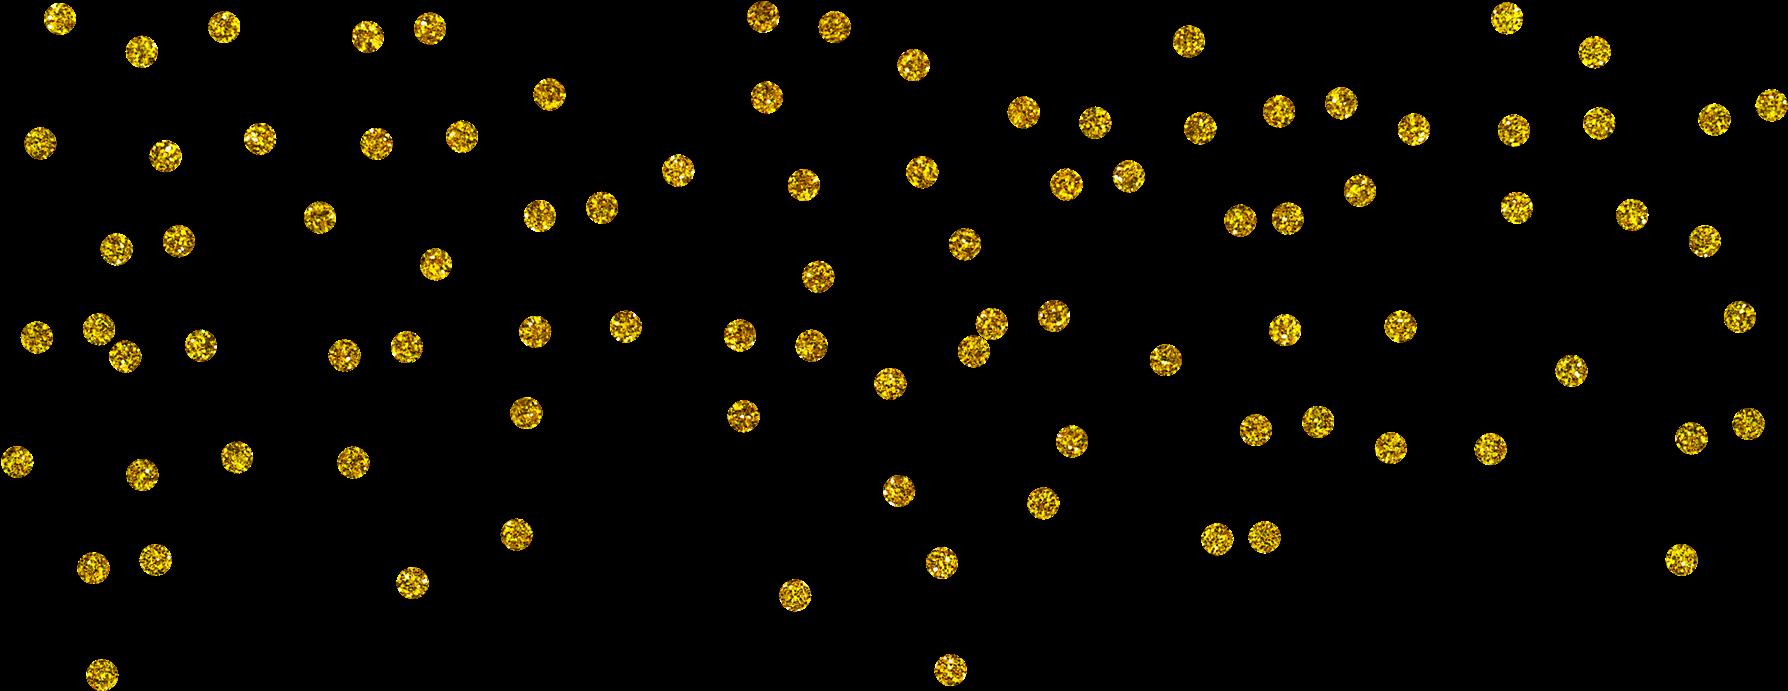 Gold foil confetti clipart vector freeuse Desktop Wallpaper Clip Art - Gold Foil Confetti Png , Transparent ... vector freeuse